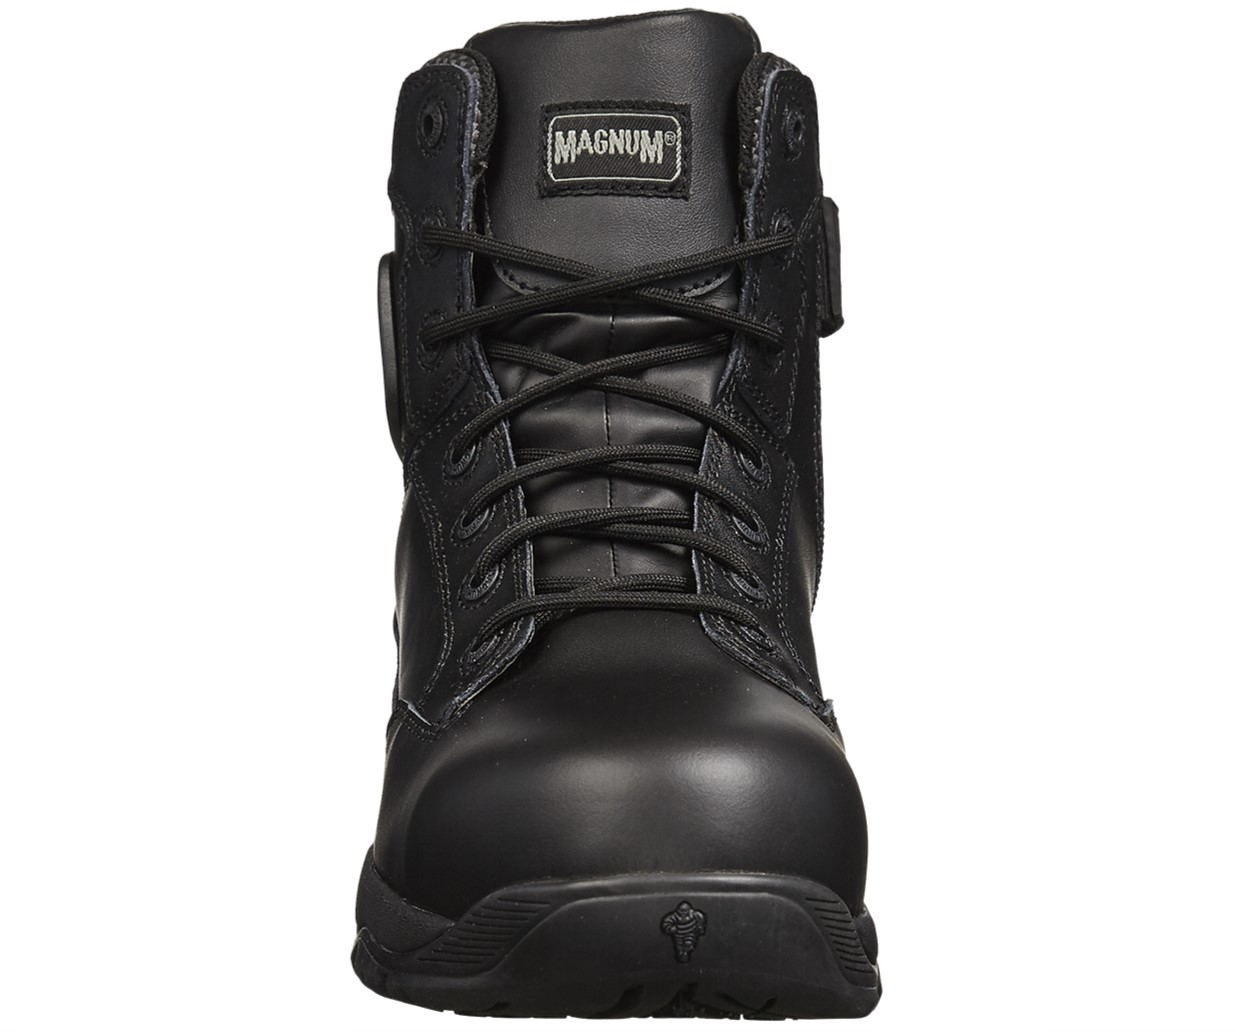 MAGNUM Strike Force 6.0 S3 black side-zip waterproof combat safety boot sz 3-14